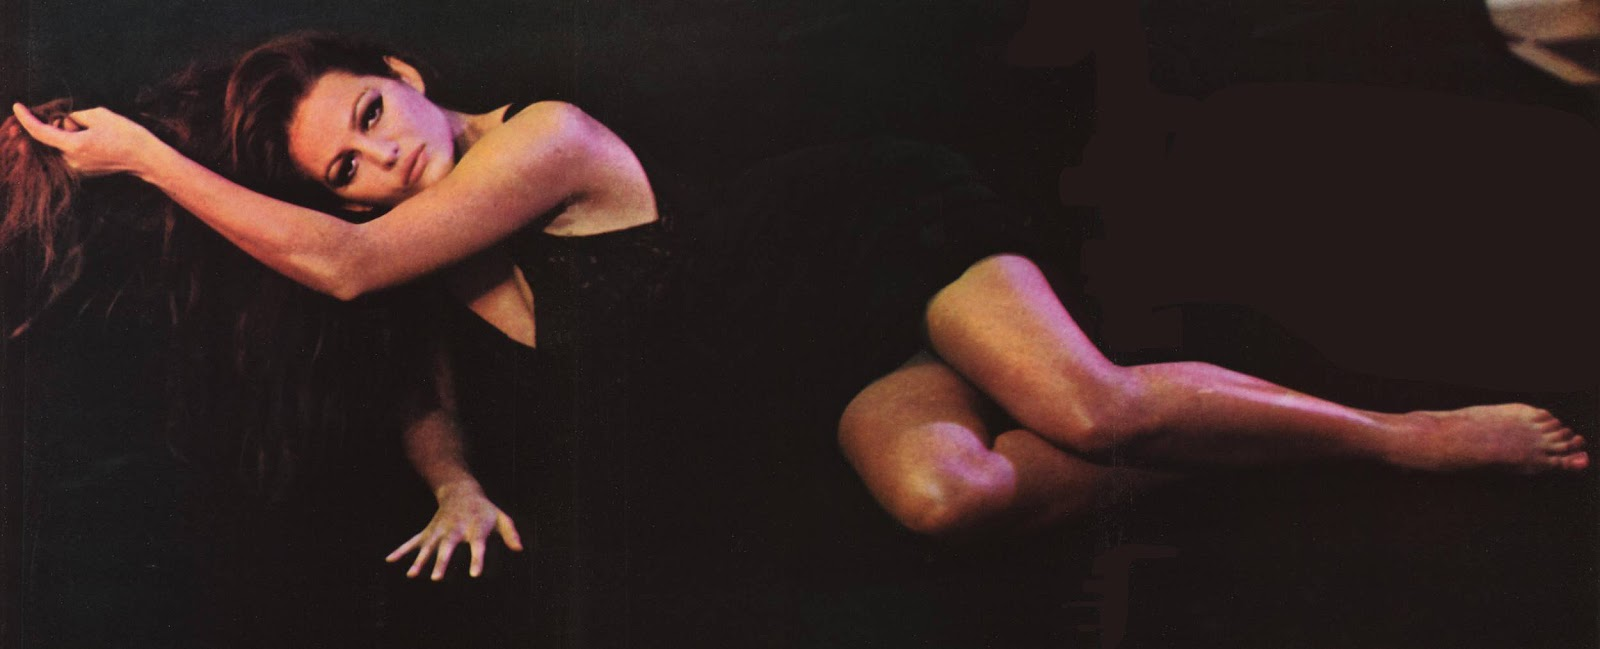 claudia cardinale feet - photo #30